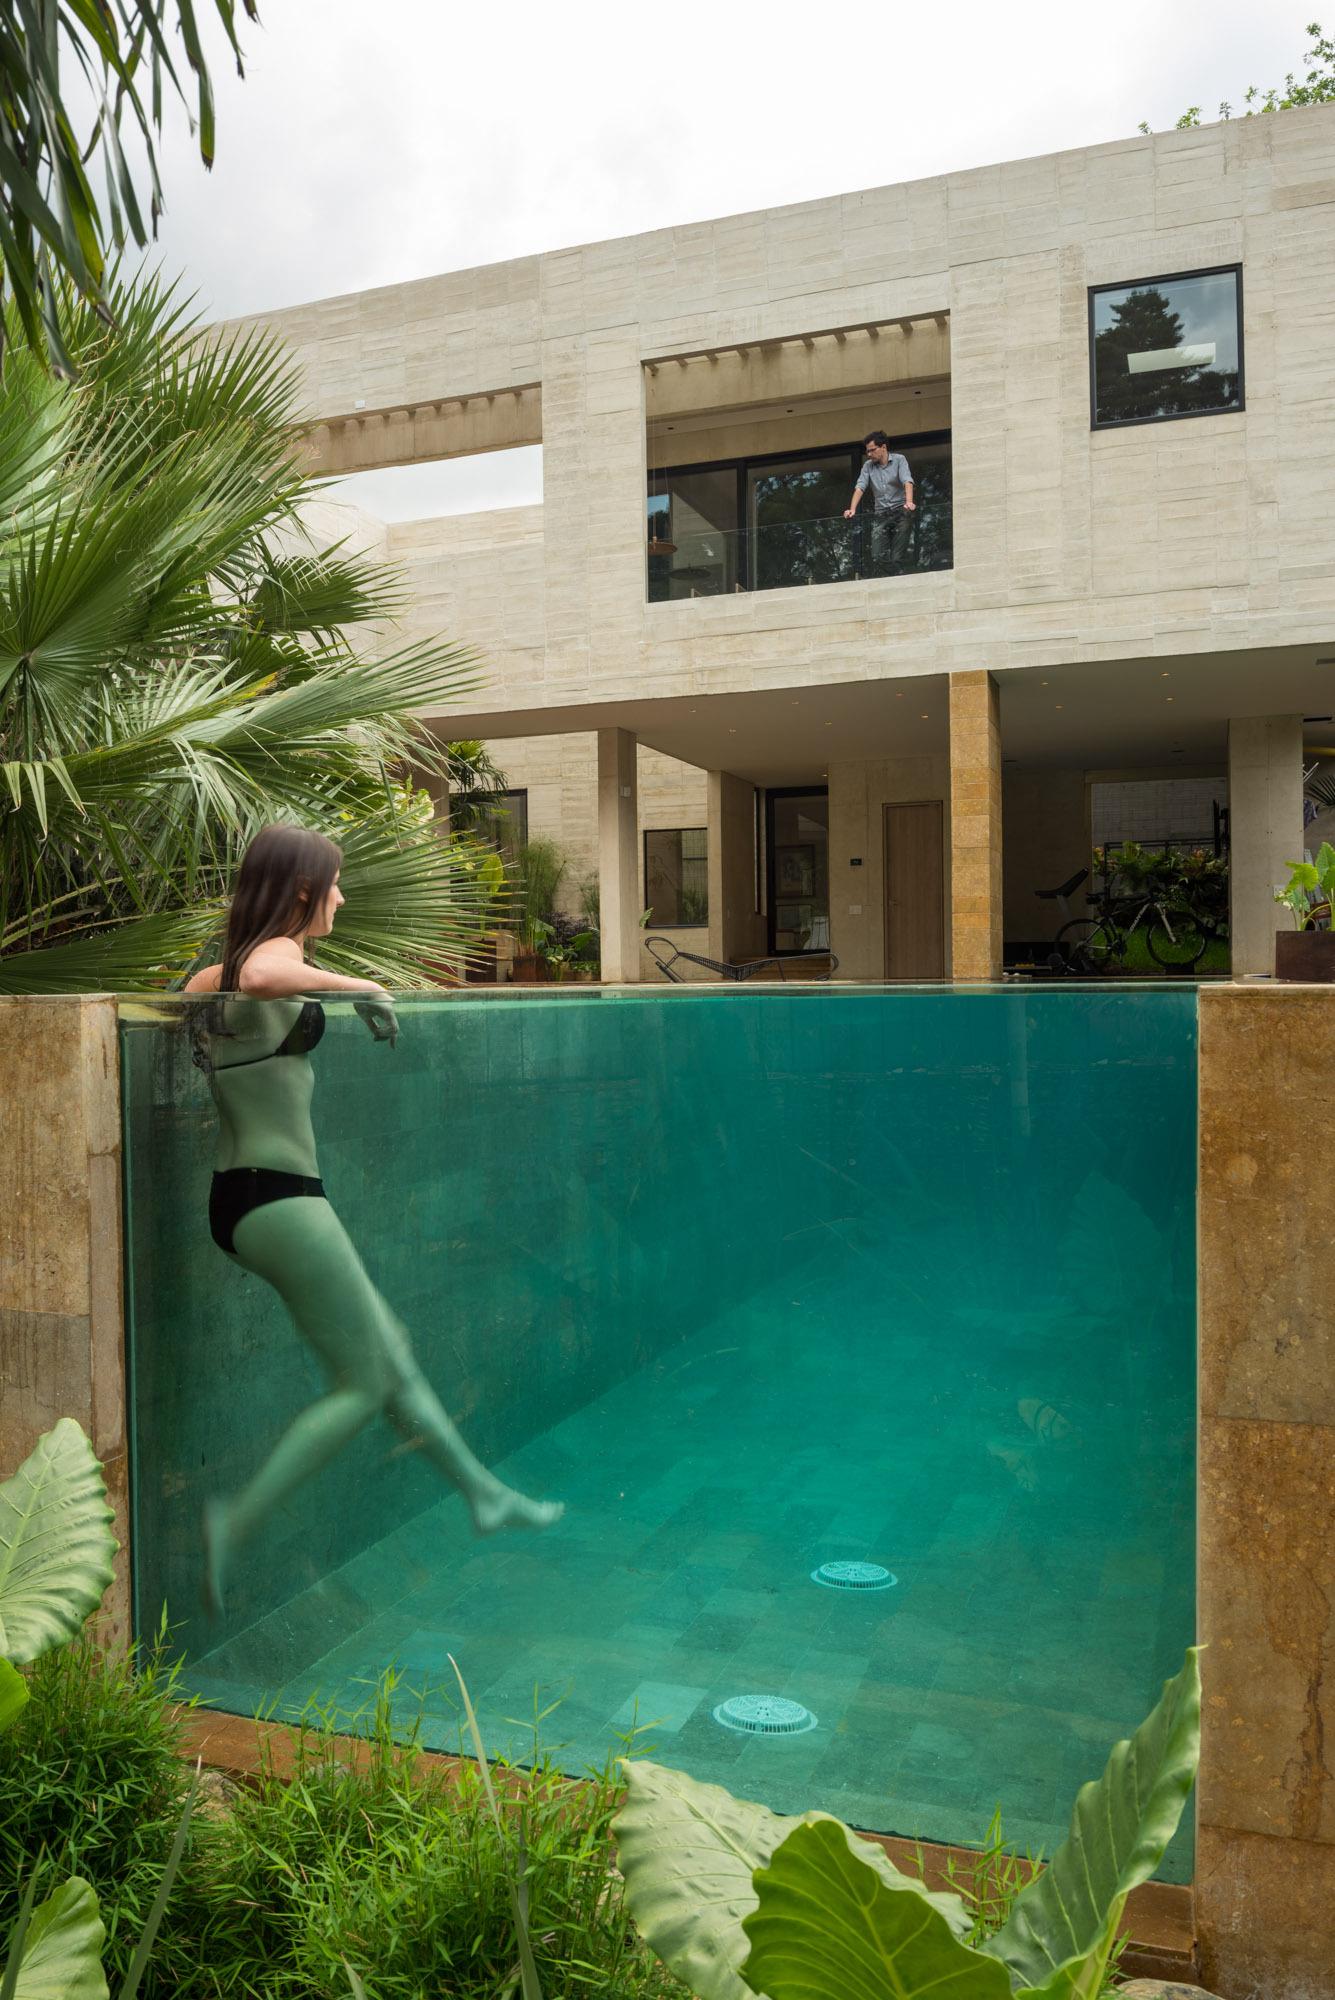 Garden house connatural archdaily for Jardin chico casa